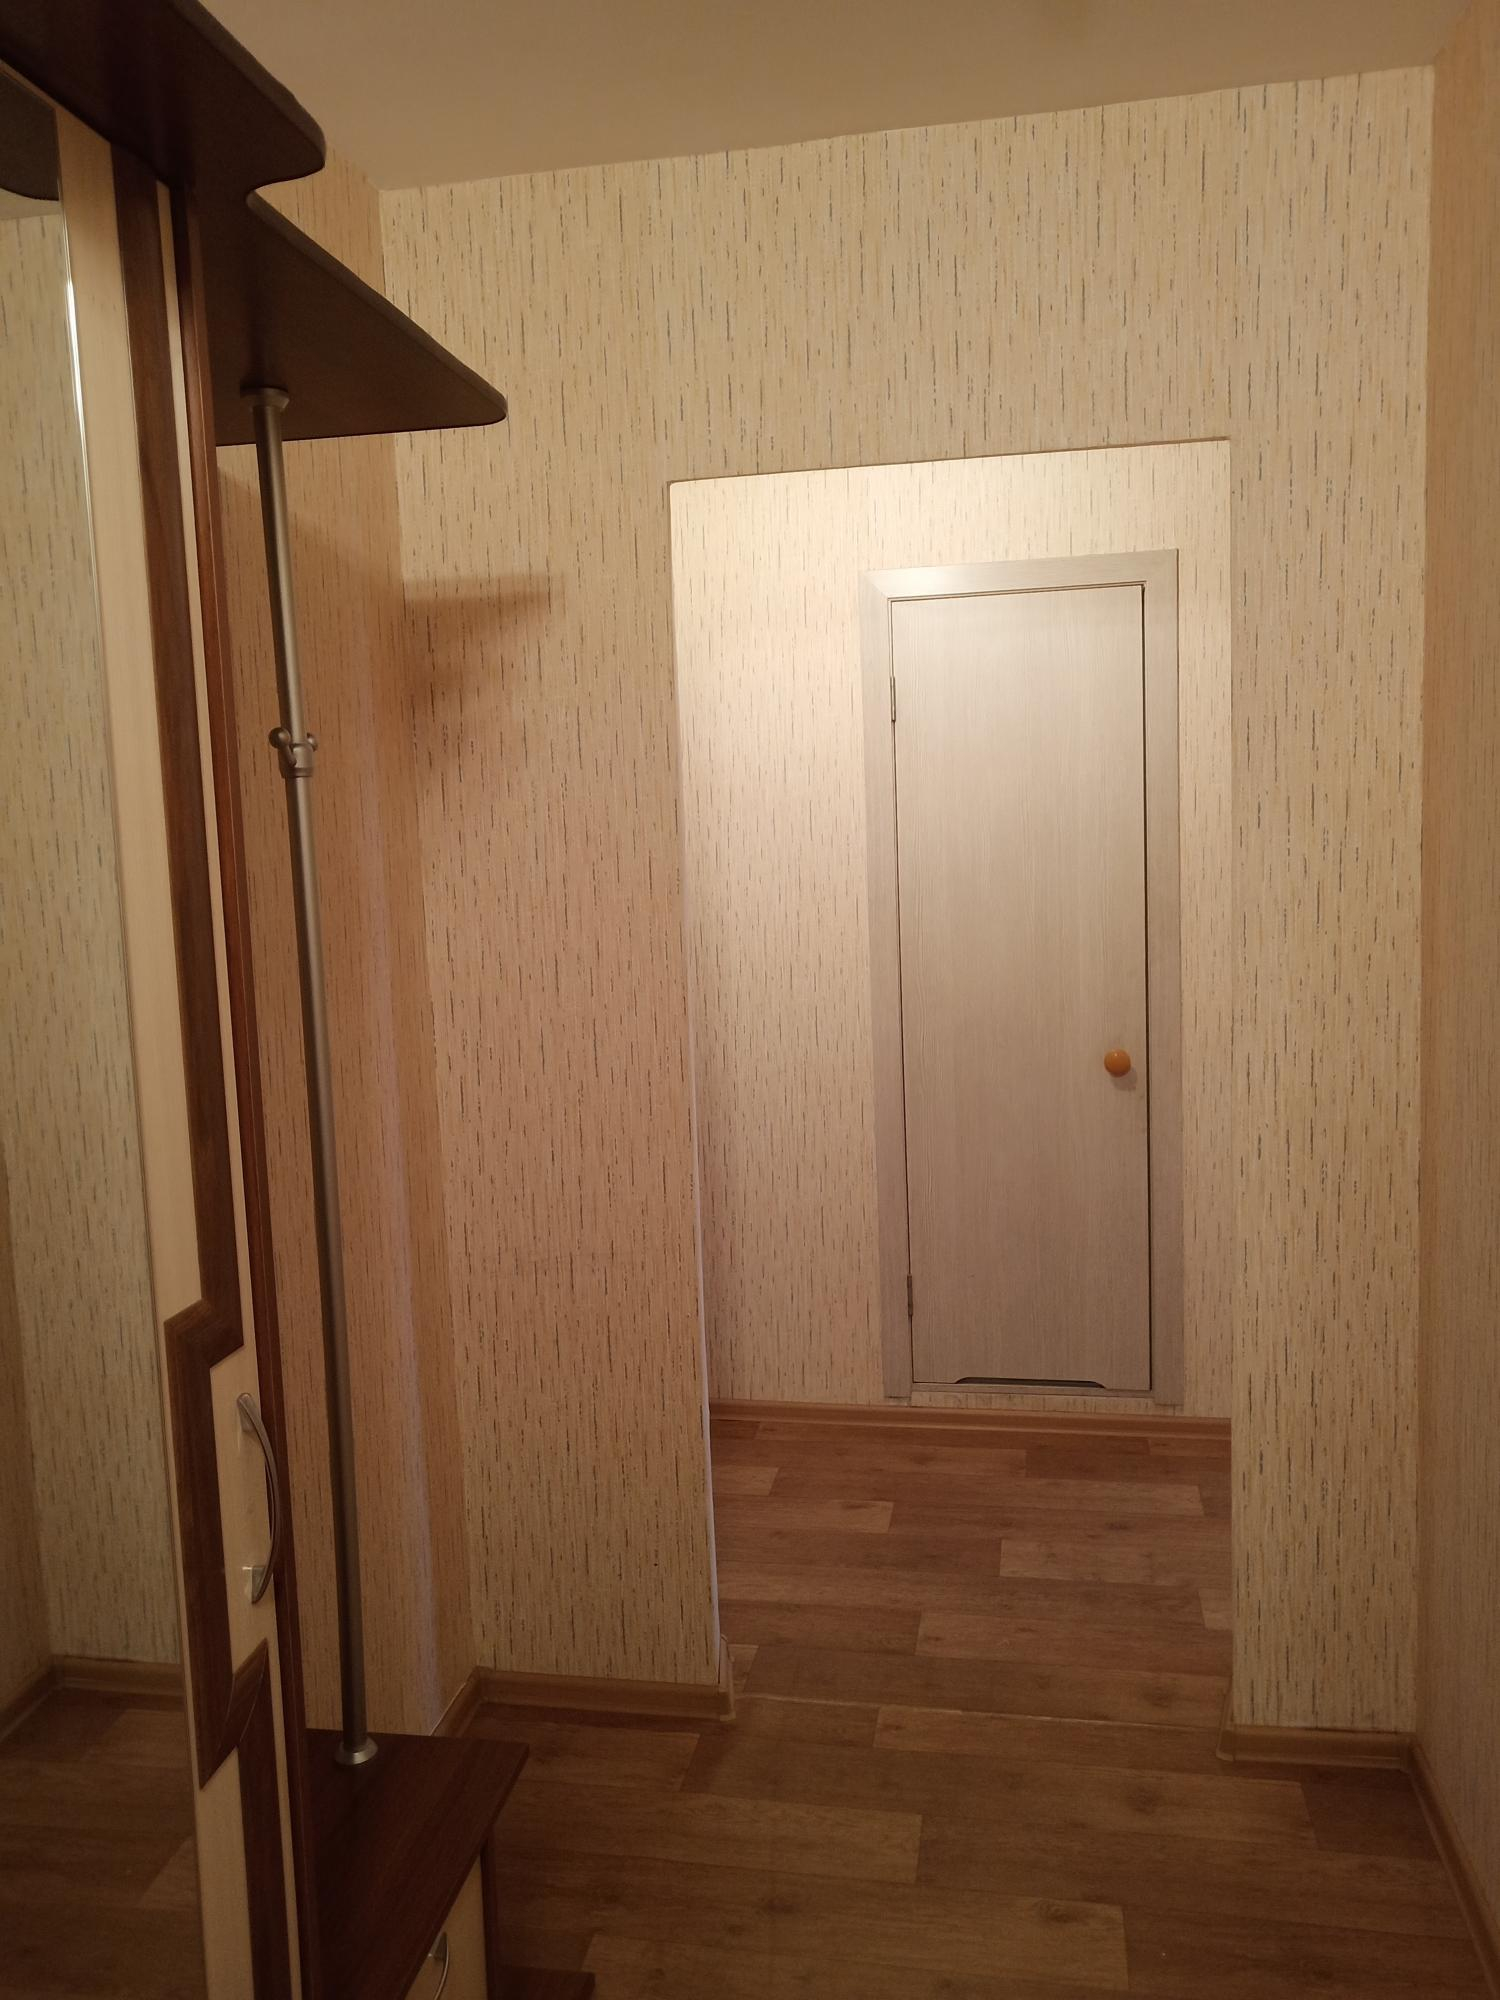 1к квартира улица Партизана Железняка, 61   17000   аренда в Красноярске фото 12